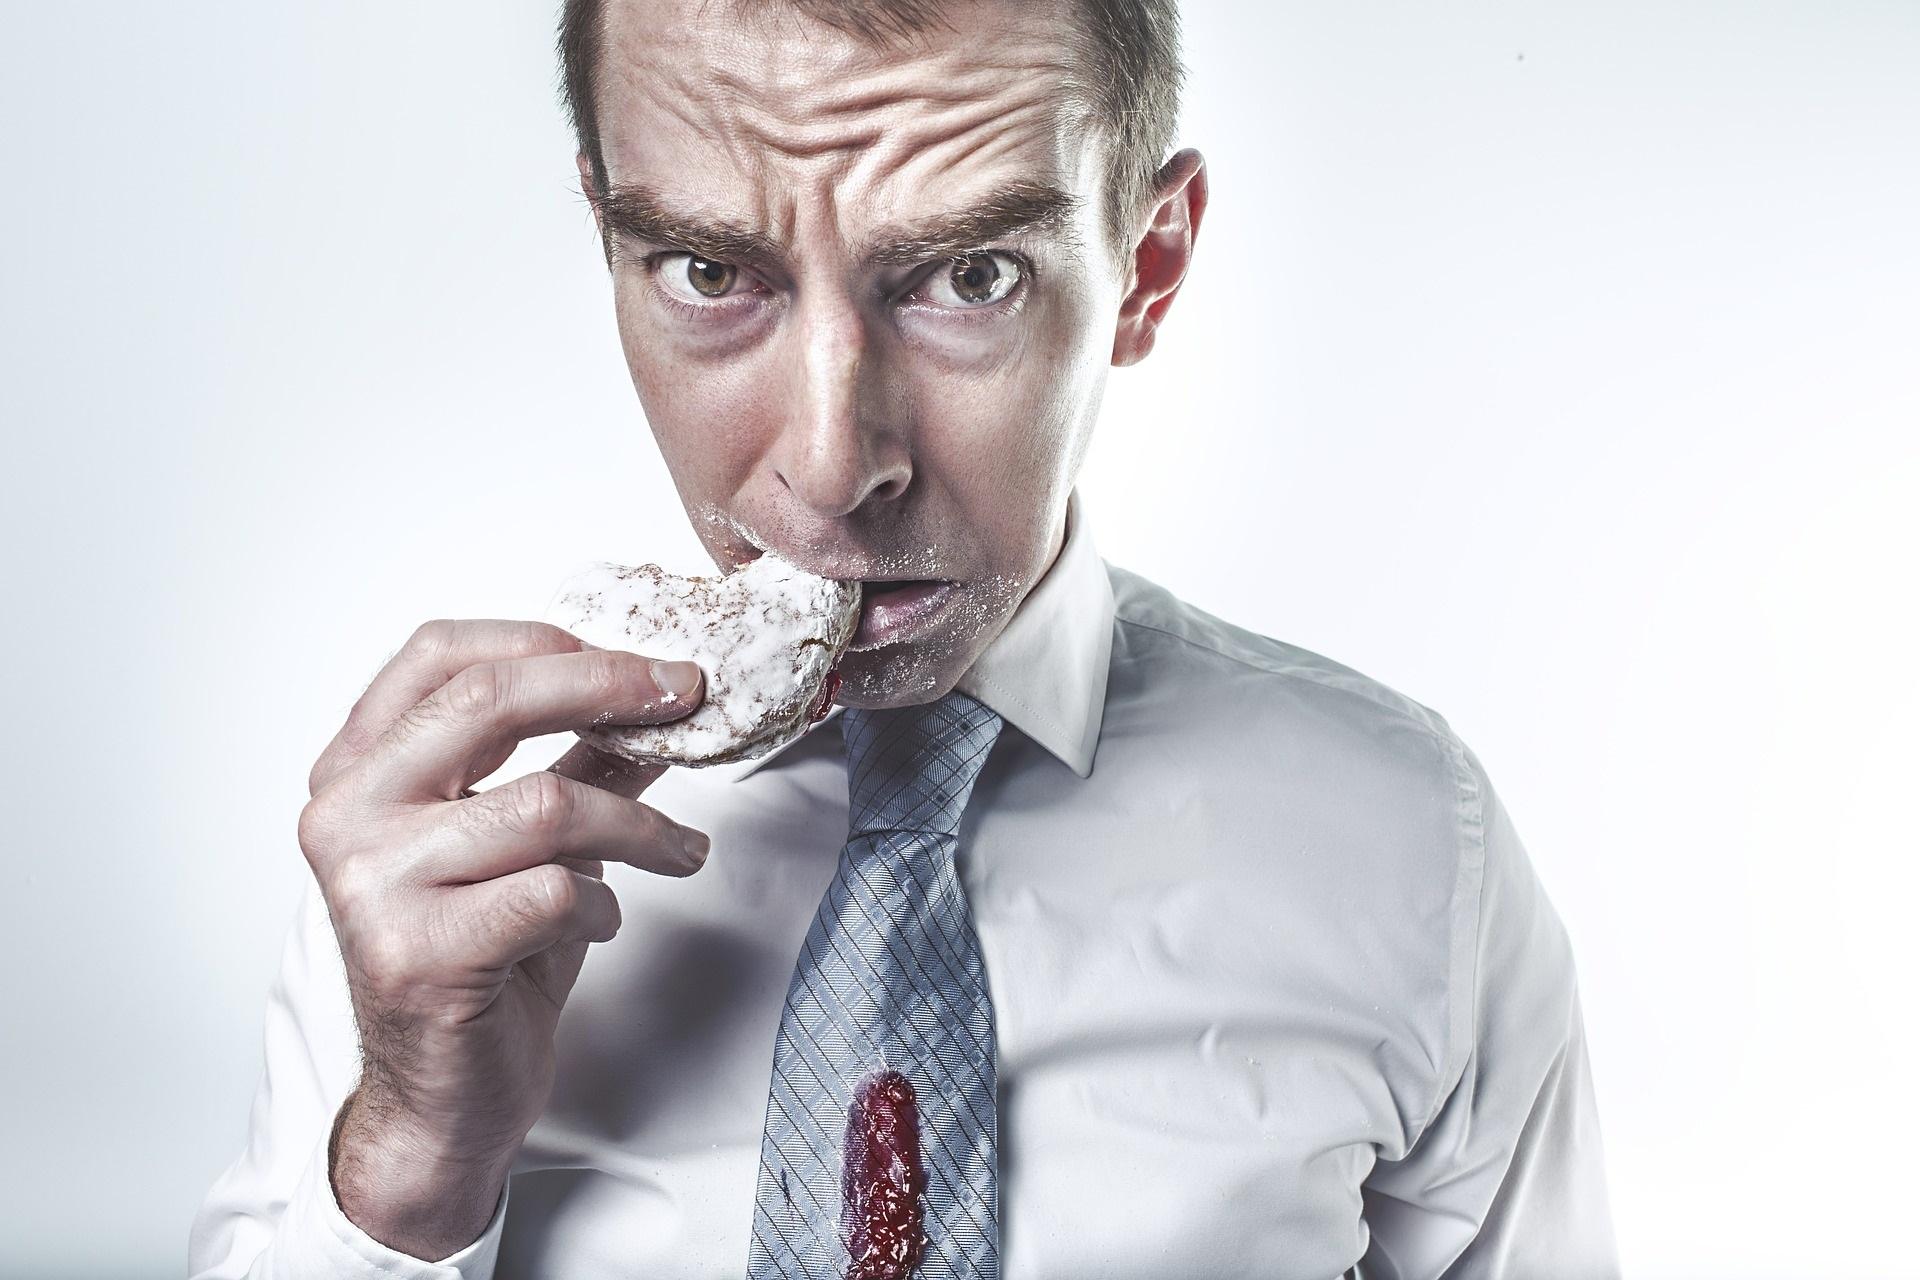 emotional eating food stress man worry